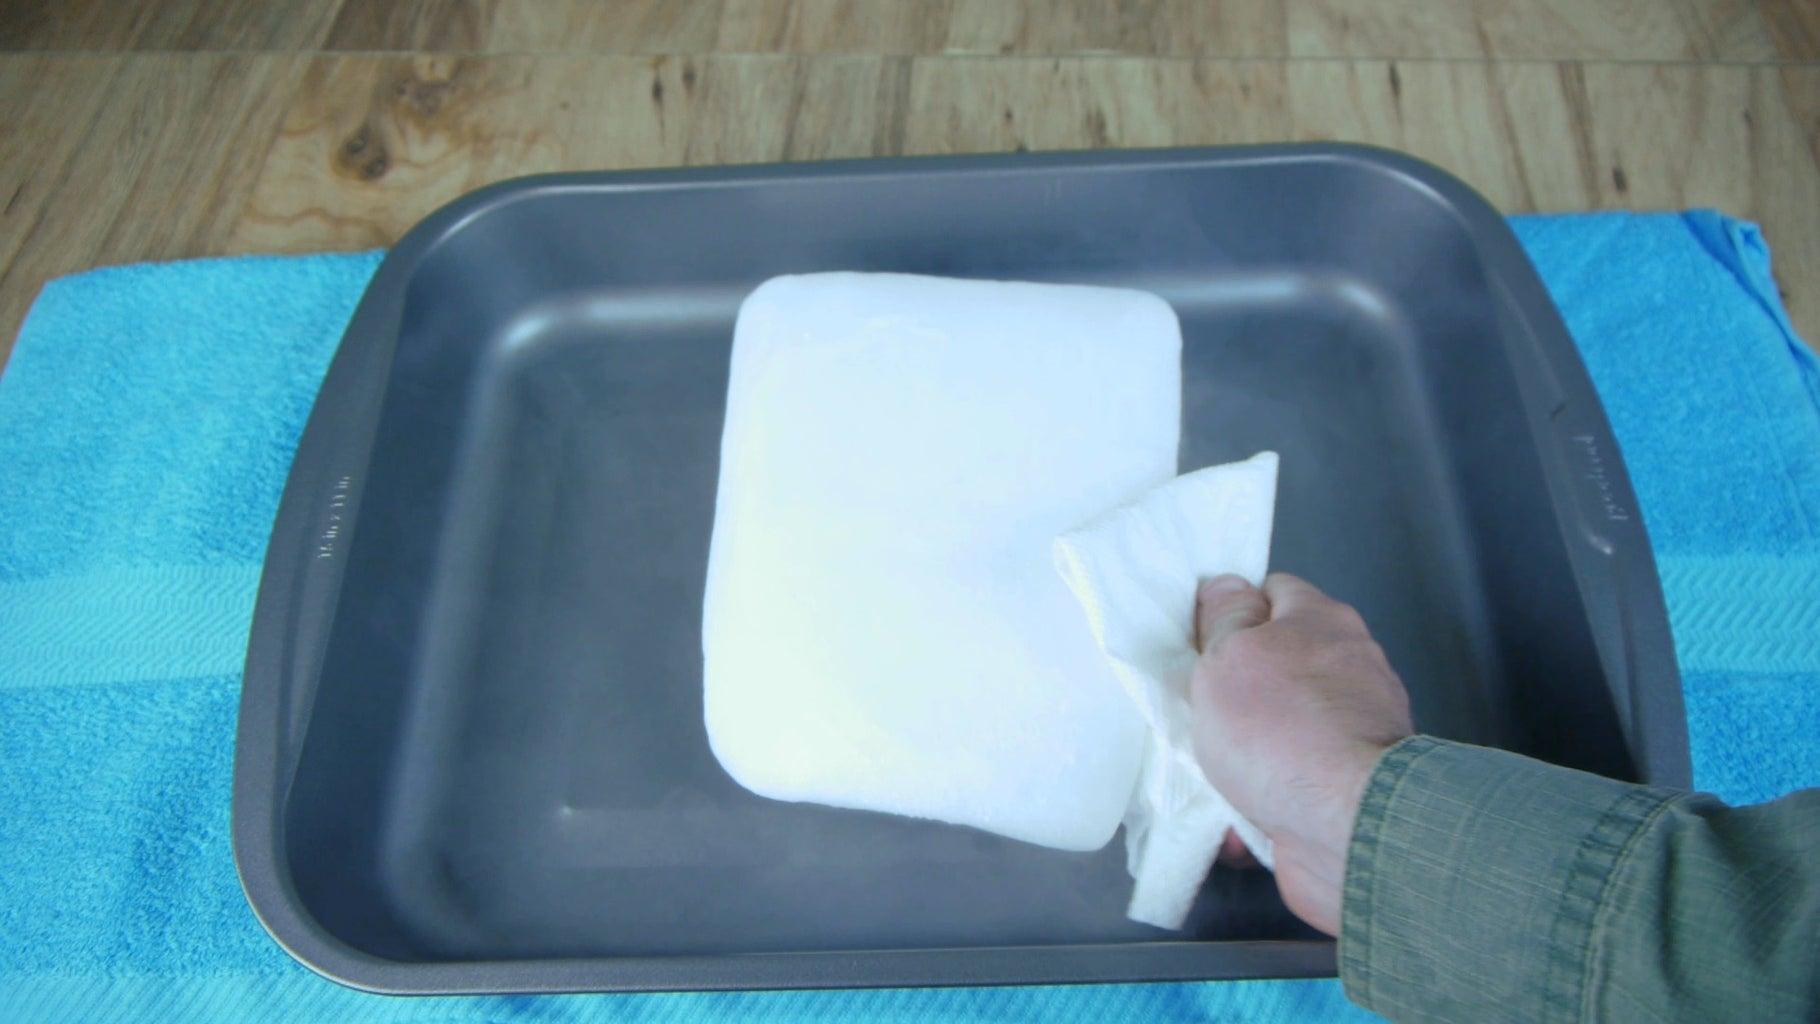 Preparing the Cold Plate